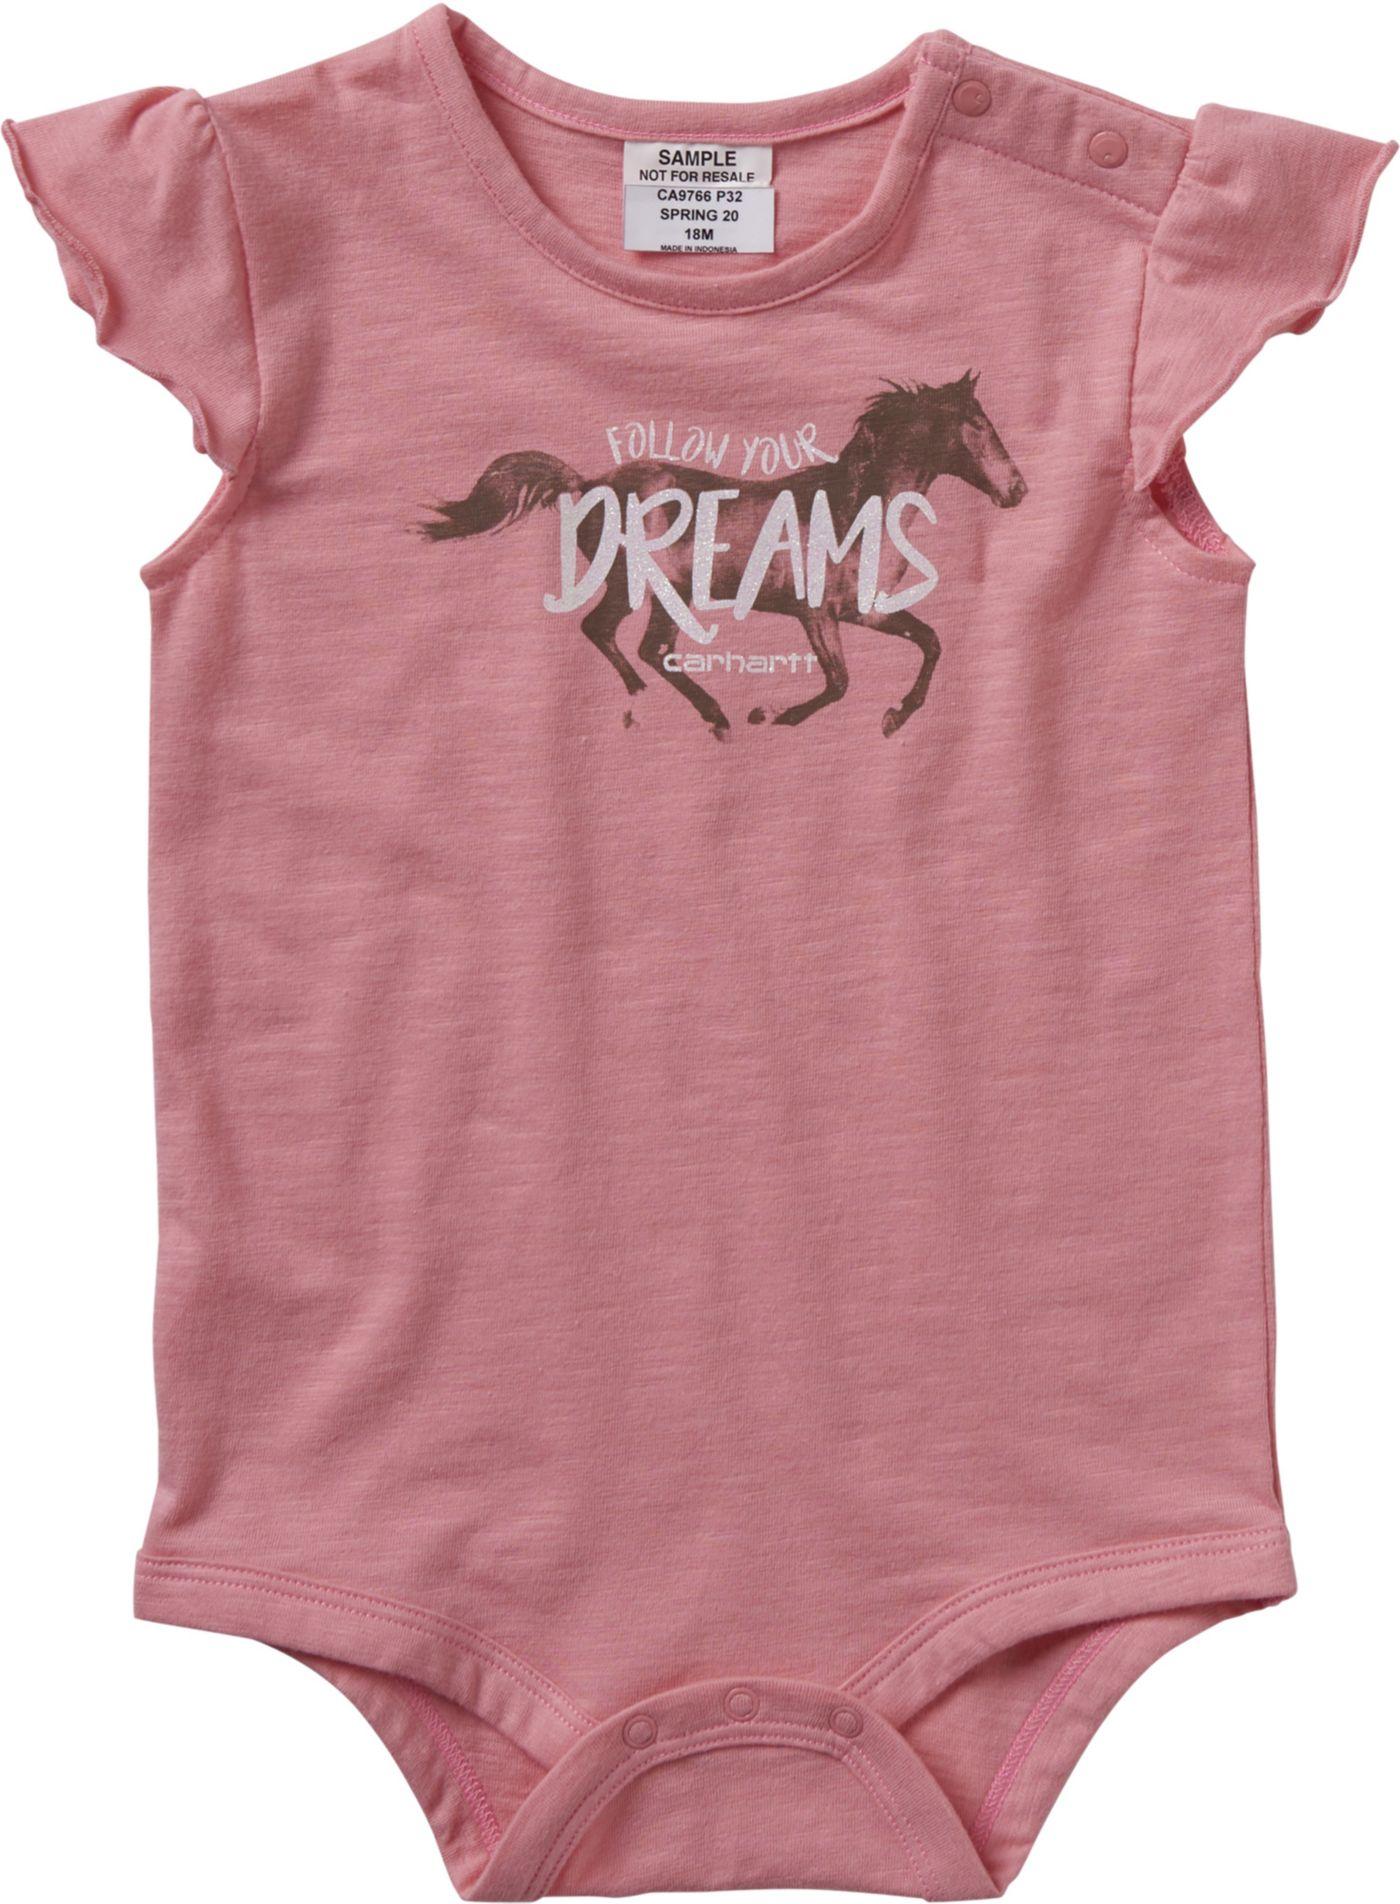 Carhartt Infant Girls' Dreams Short Sleeve Onesie